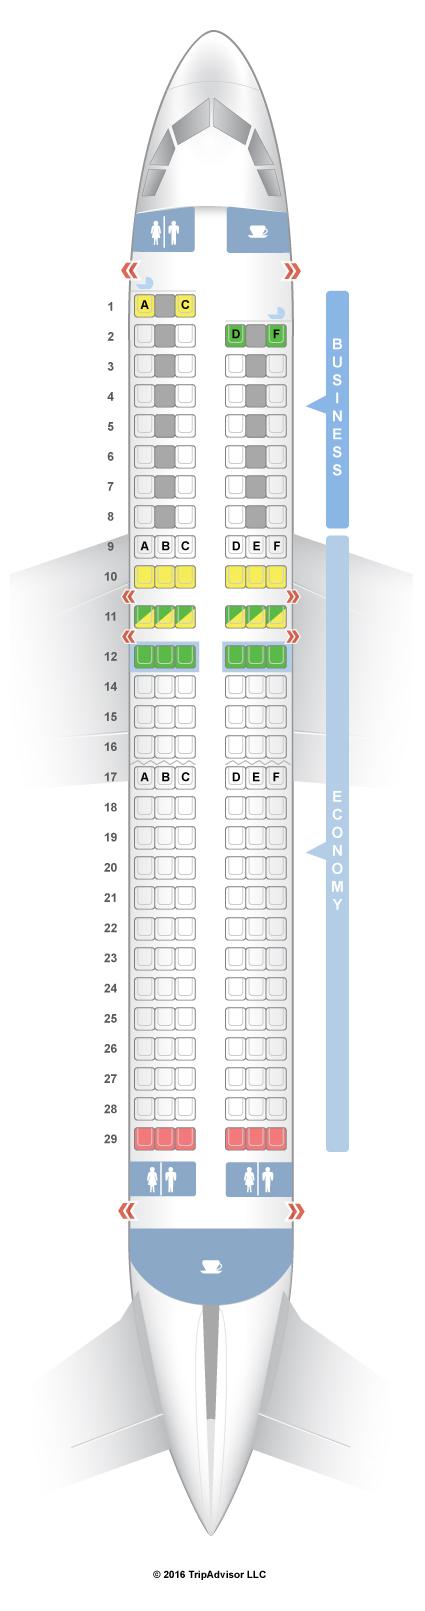 Seatguru Seat Map Air France Airbus A320 320 Europe Seatguru